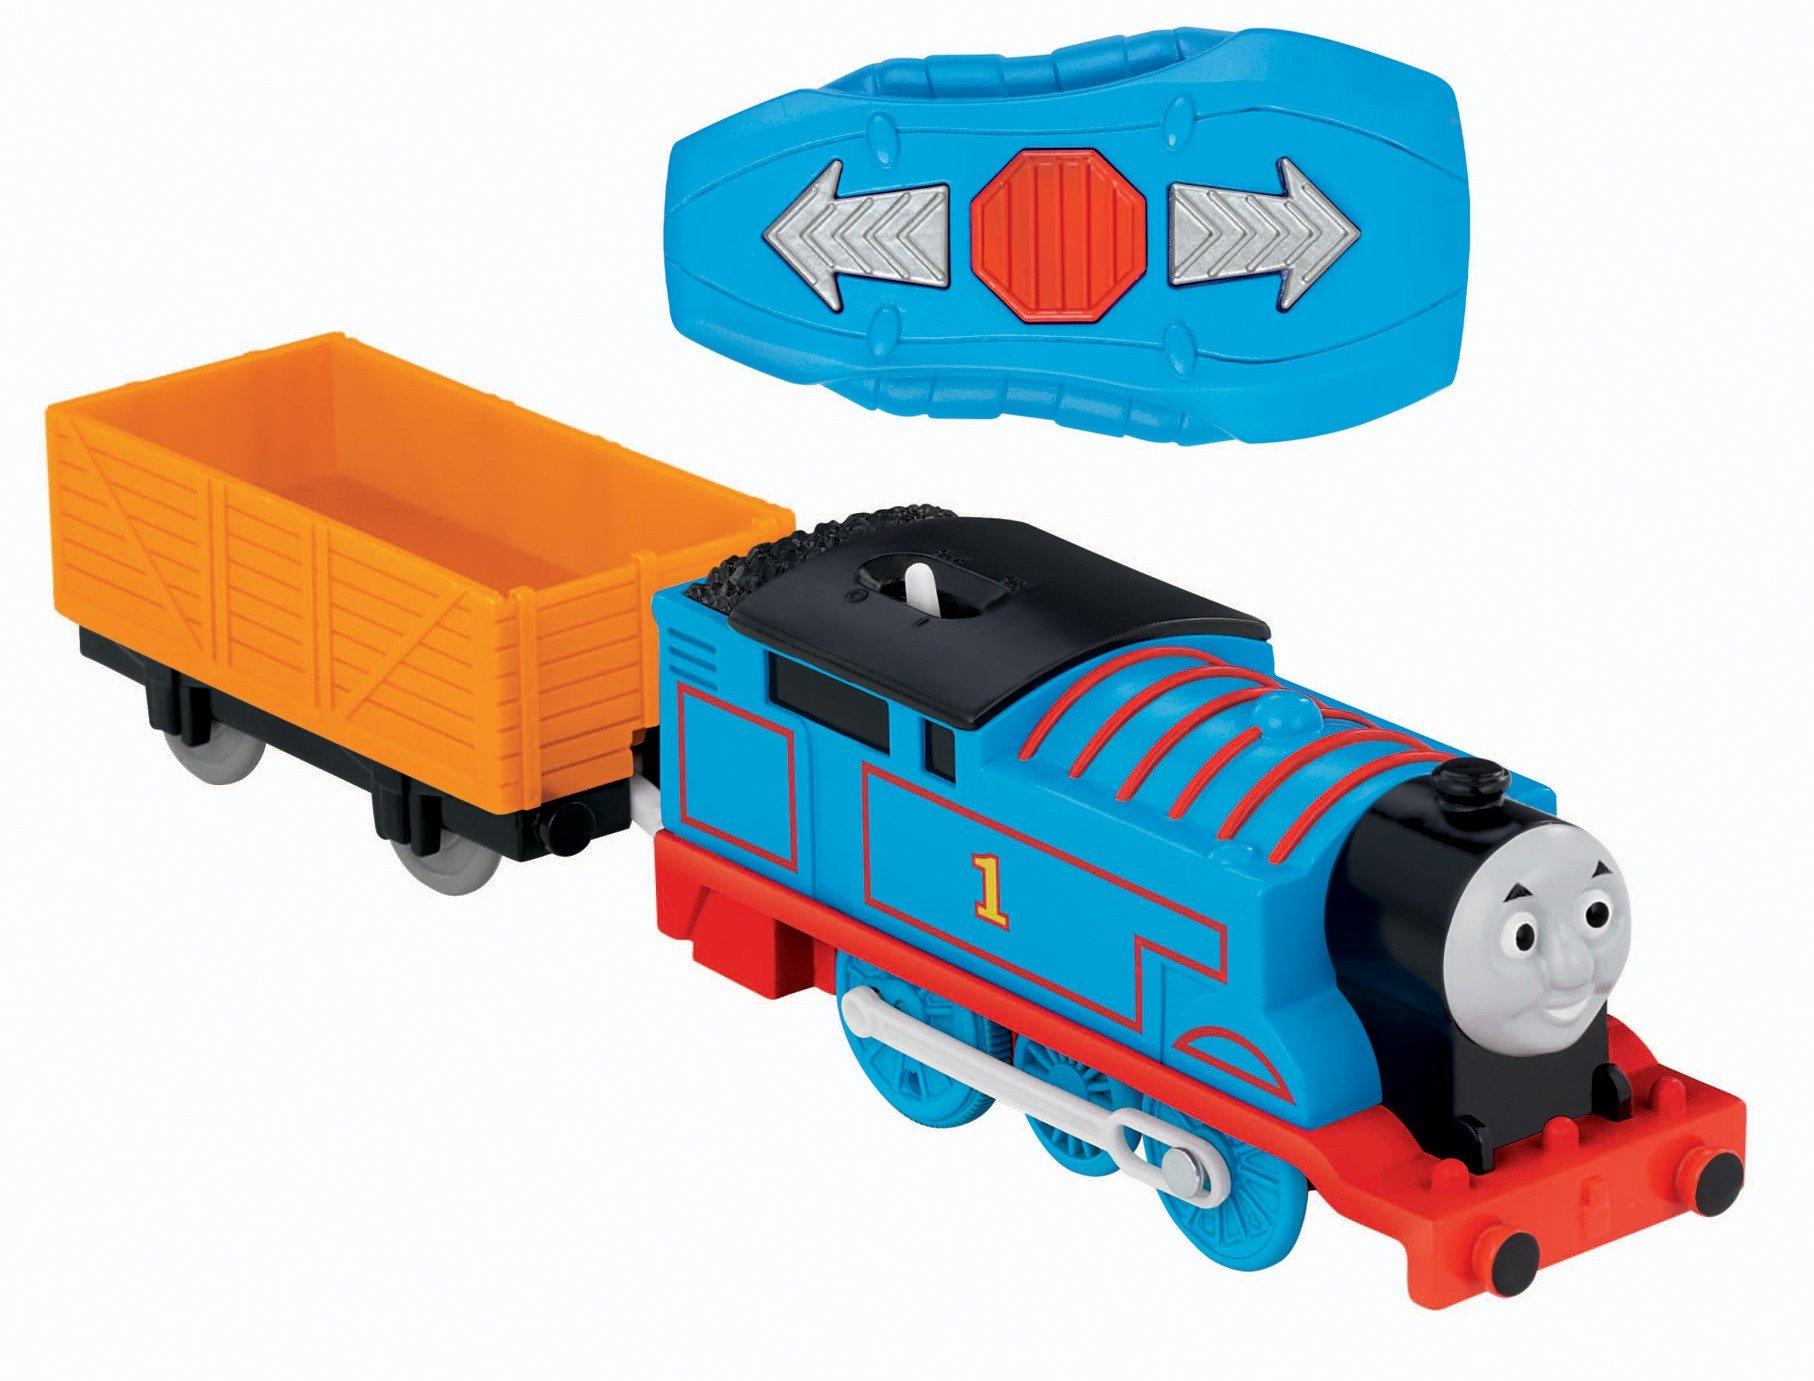 Thomas the Train: TrackMaster R/C Thomas